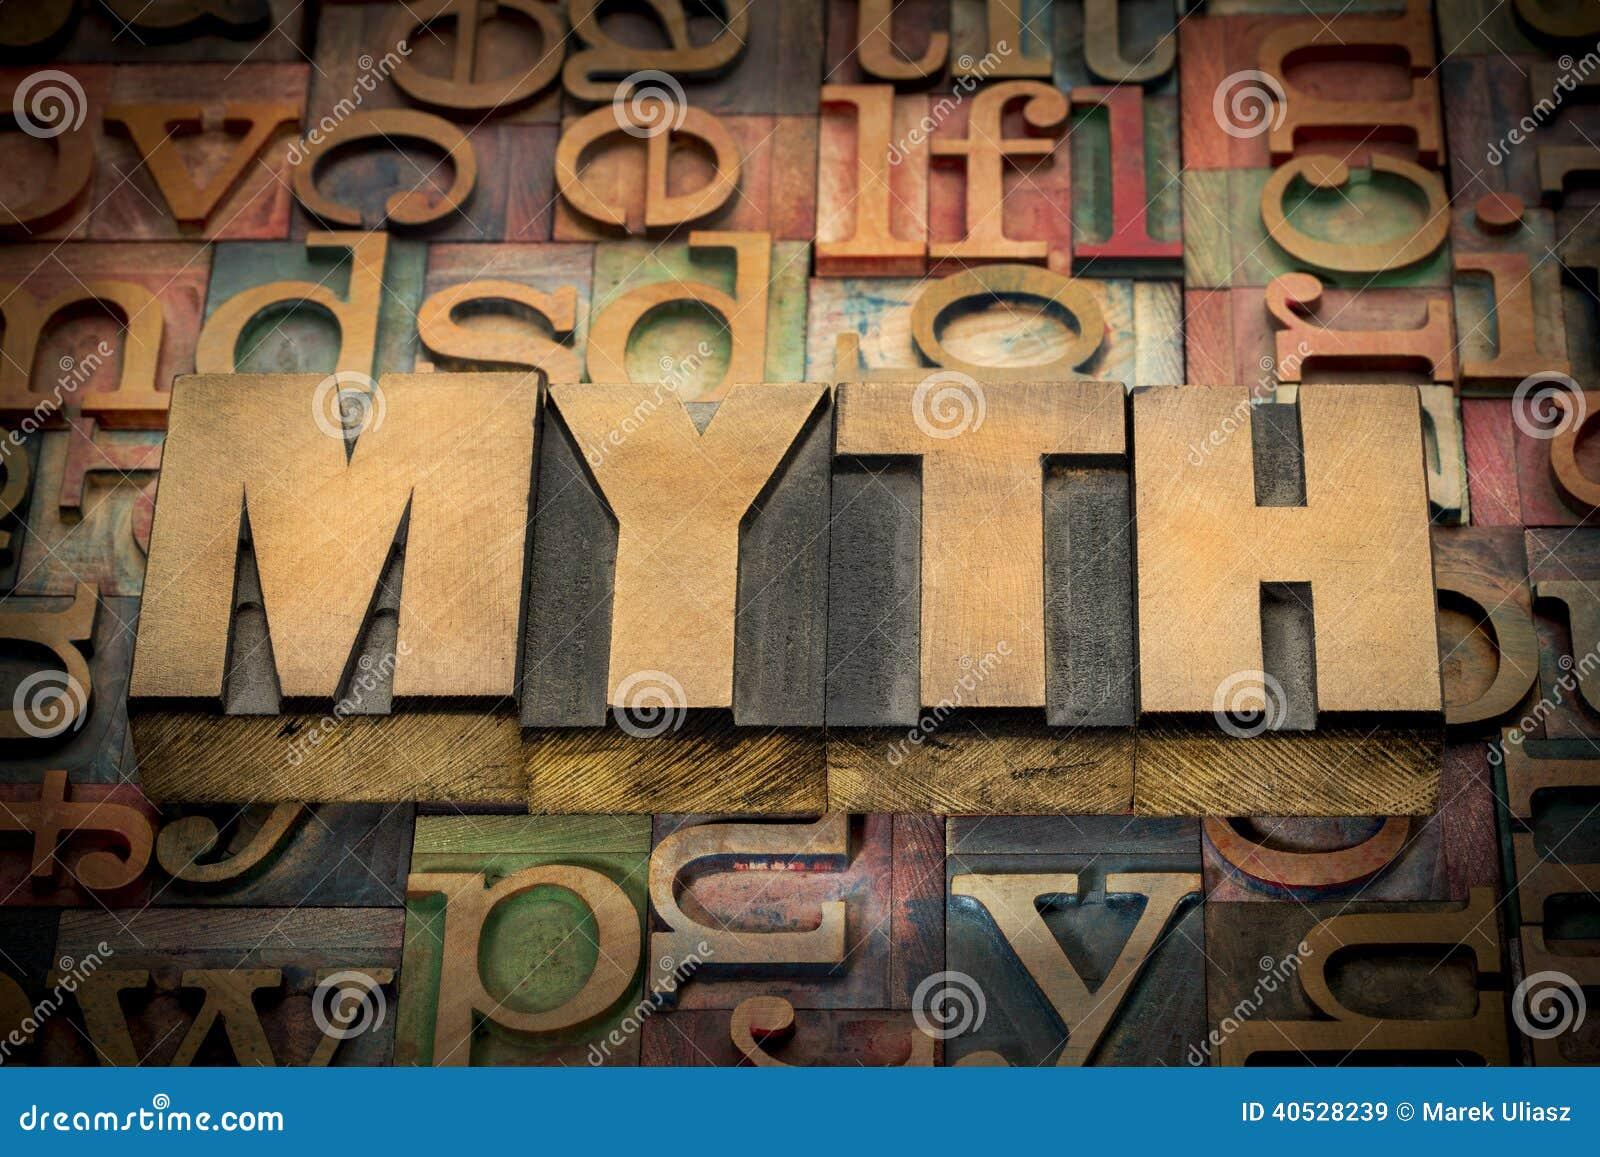 Myth word in wood type